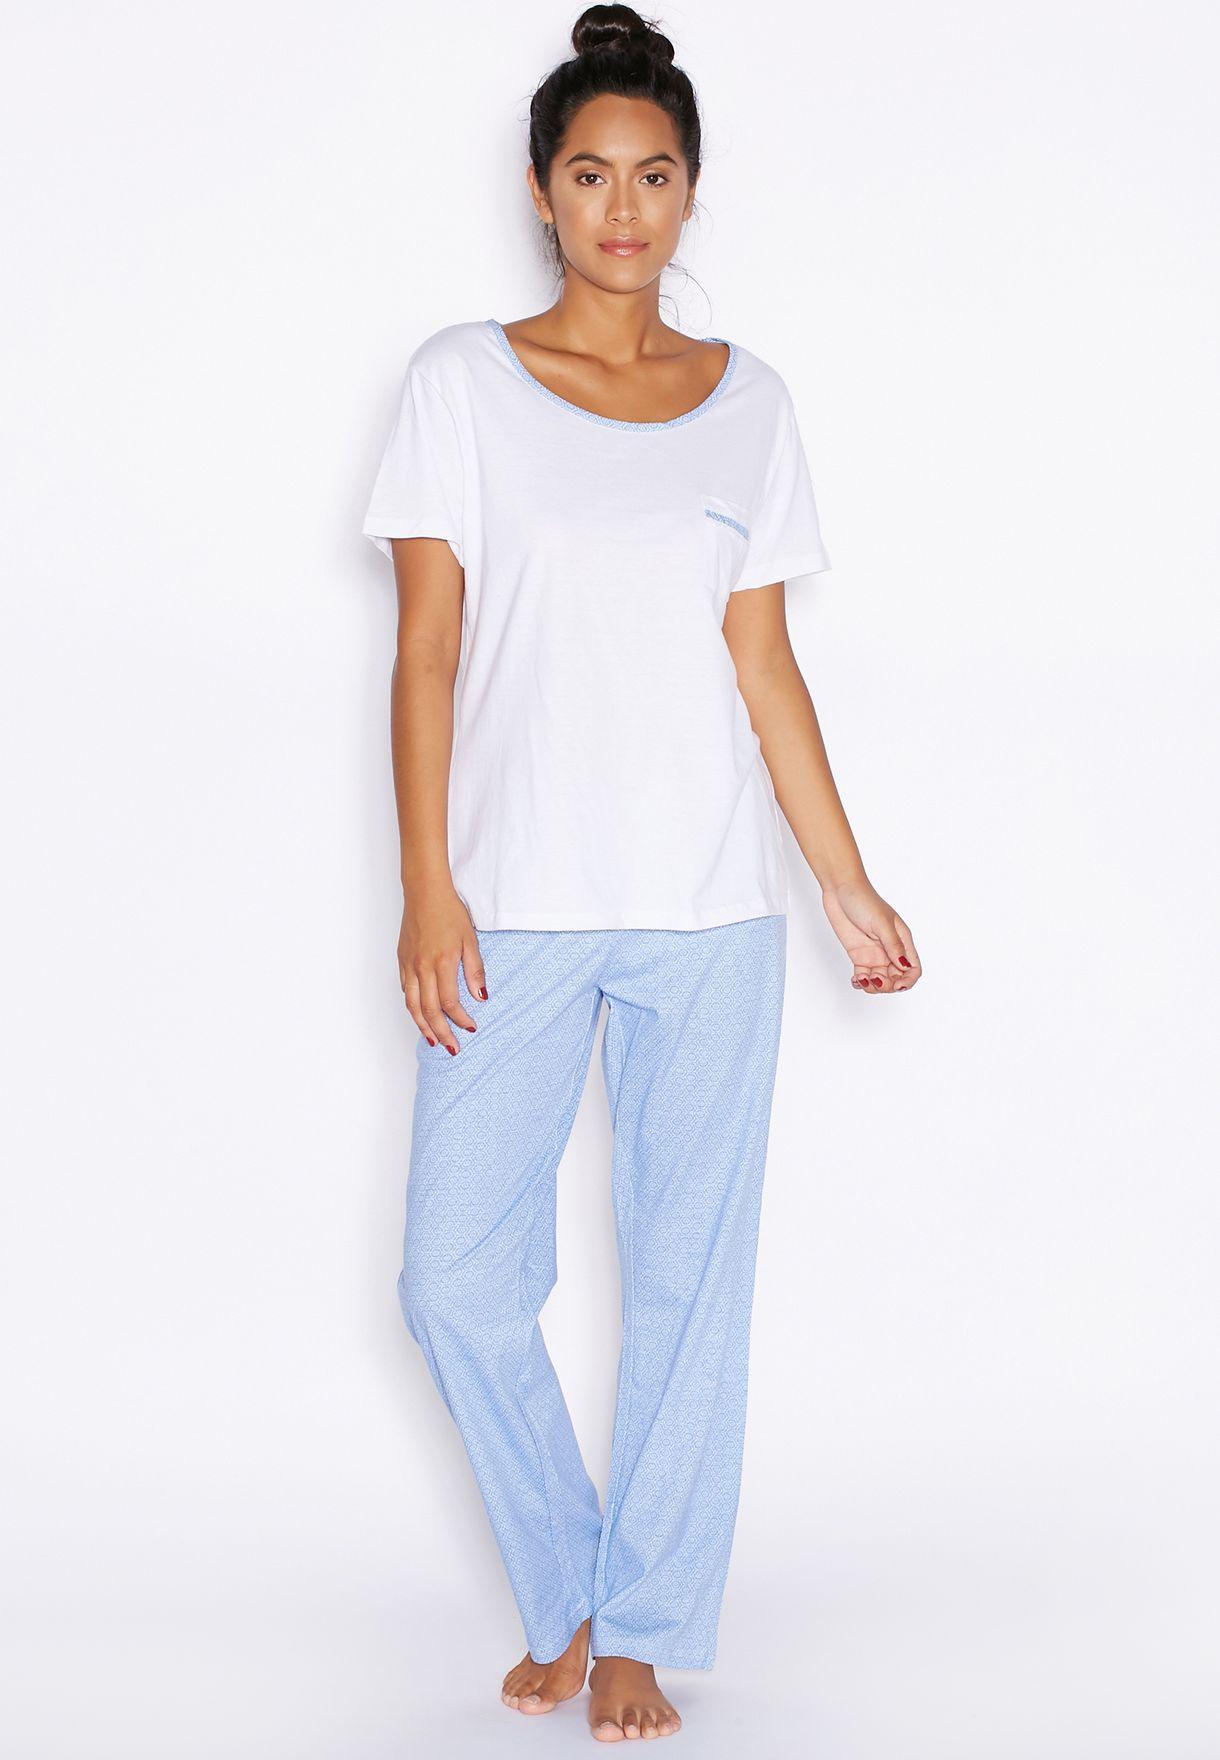 a09e56704d2 Shop Love To Lounge multicolor Contrast Trim Pyjama Set for Women in ...